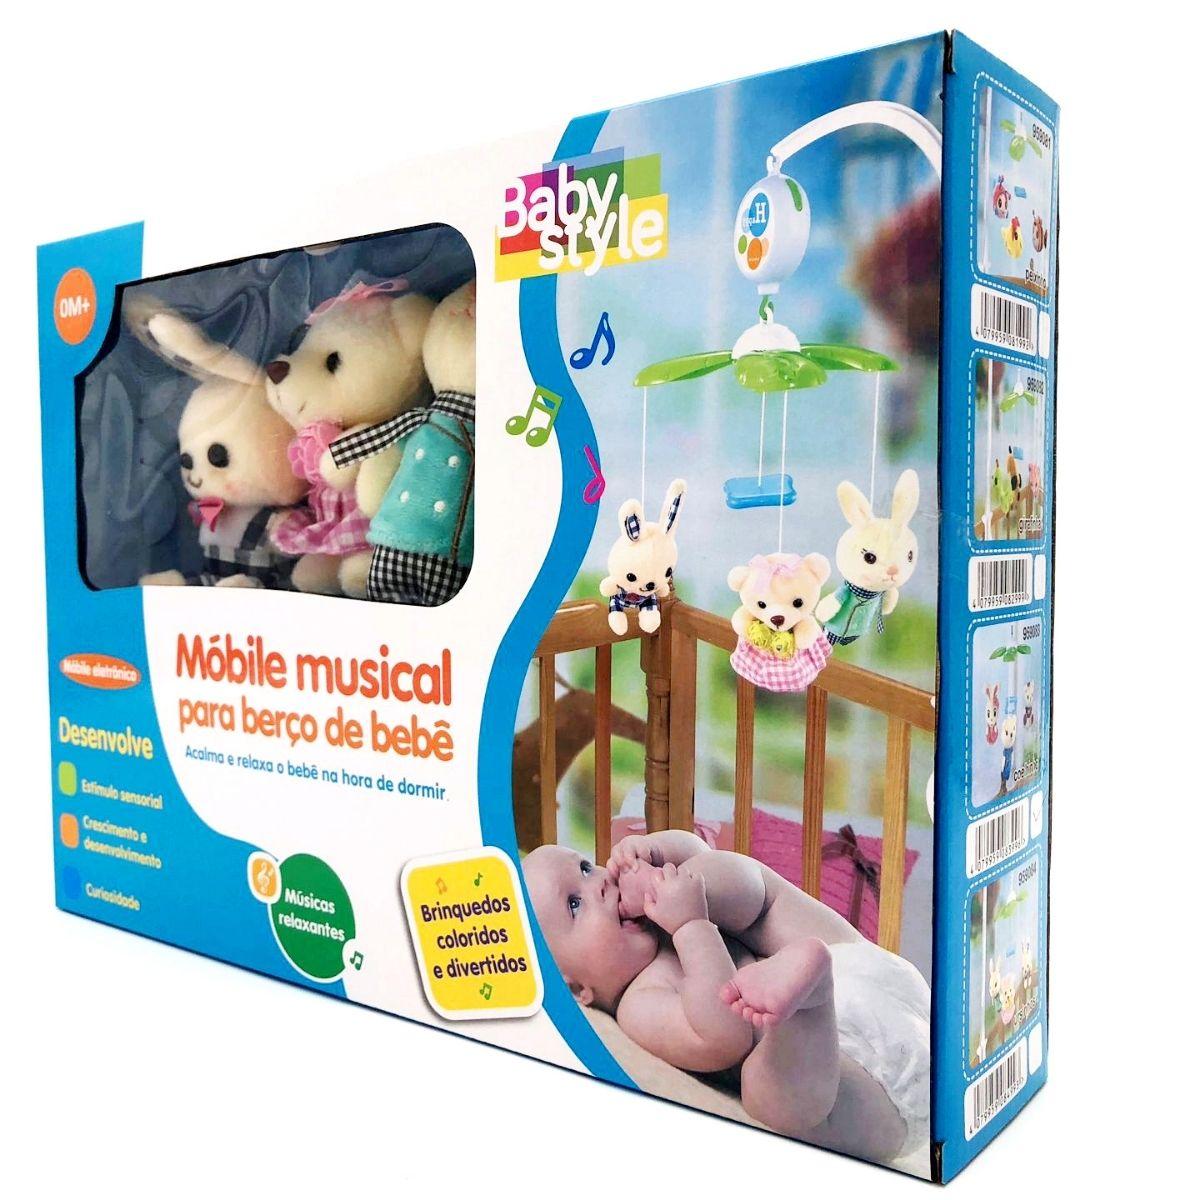 Mobile Eletrônico plush ursinho Infantil musical - baby Style